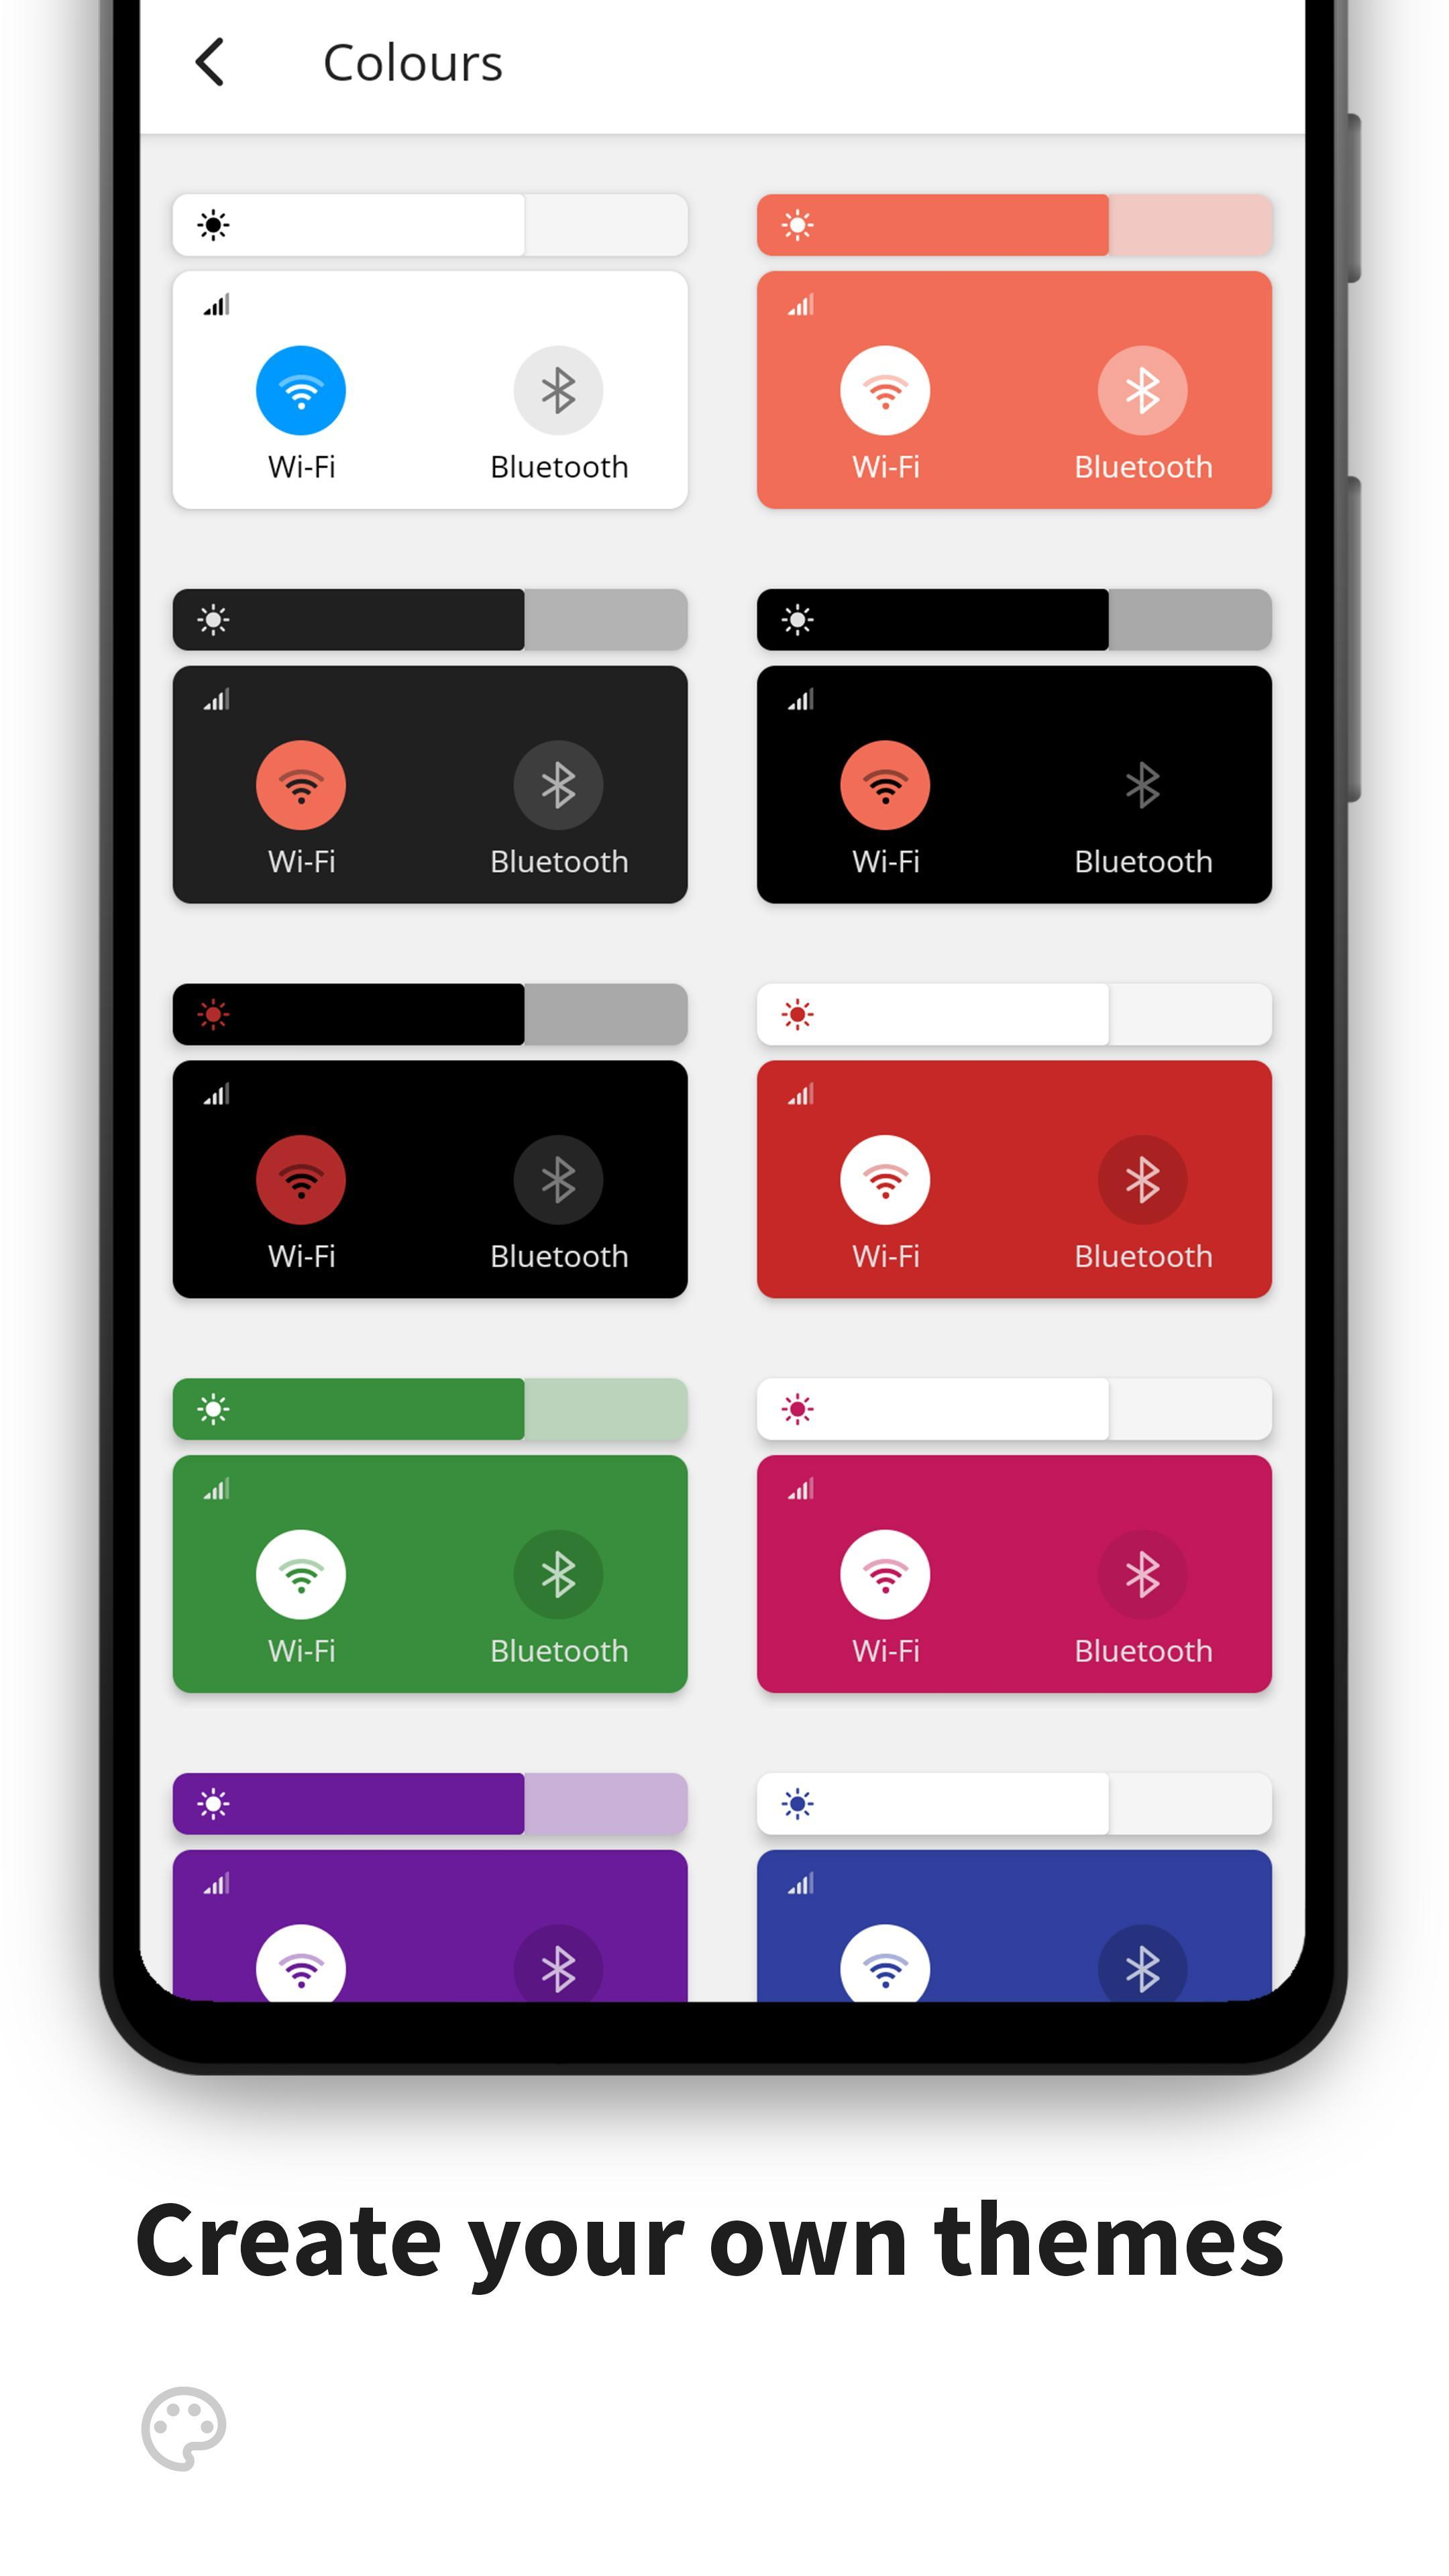 MIUI-ify Notification Shade & Quick Settings 1.7.0 Screenshot 20